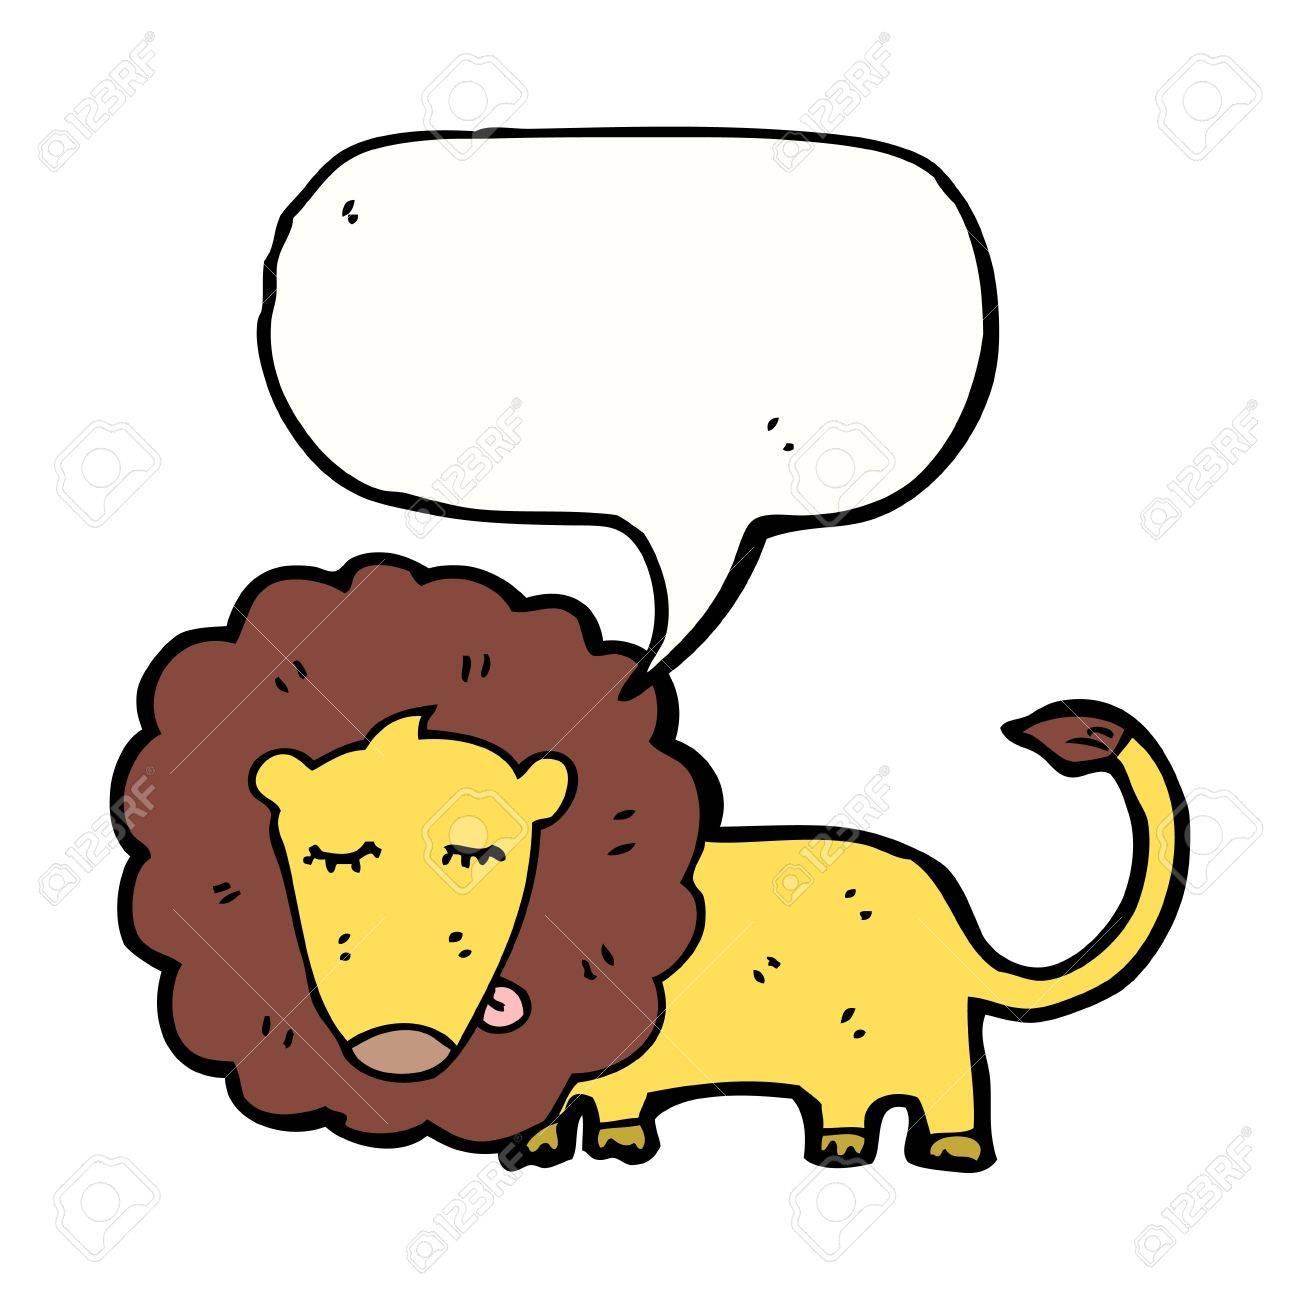 cartoon lion with speech bubble Stock Vector - 16239882